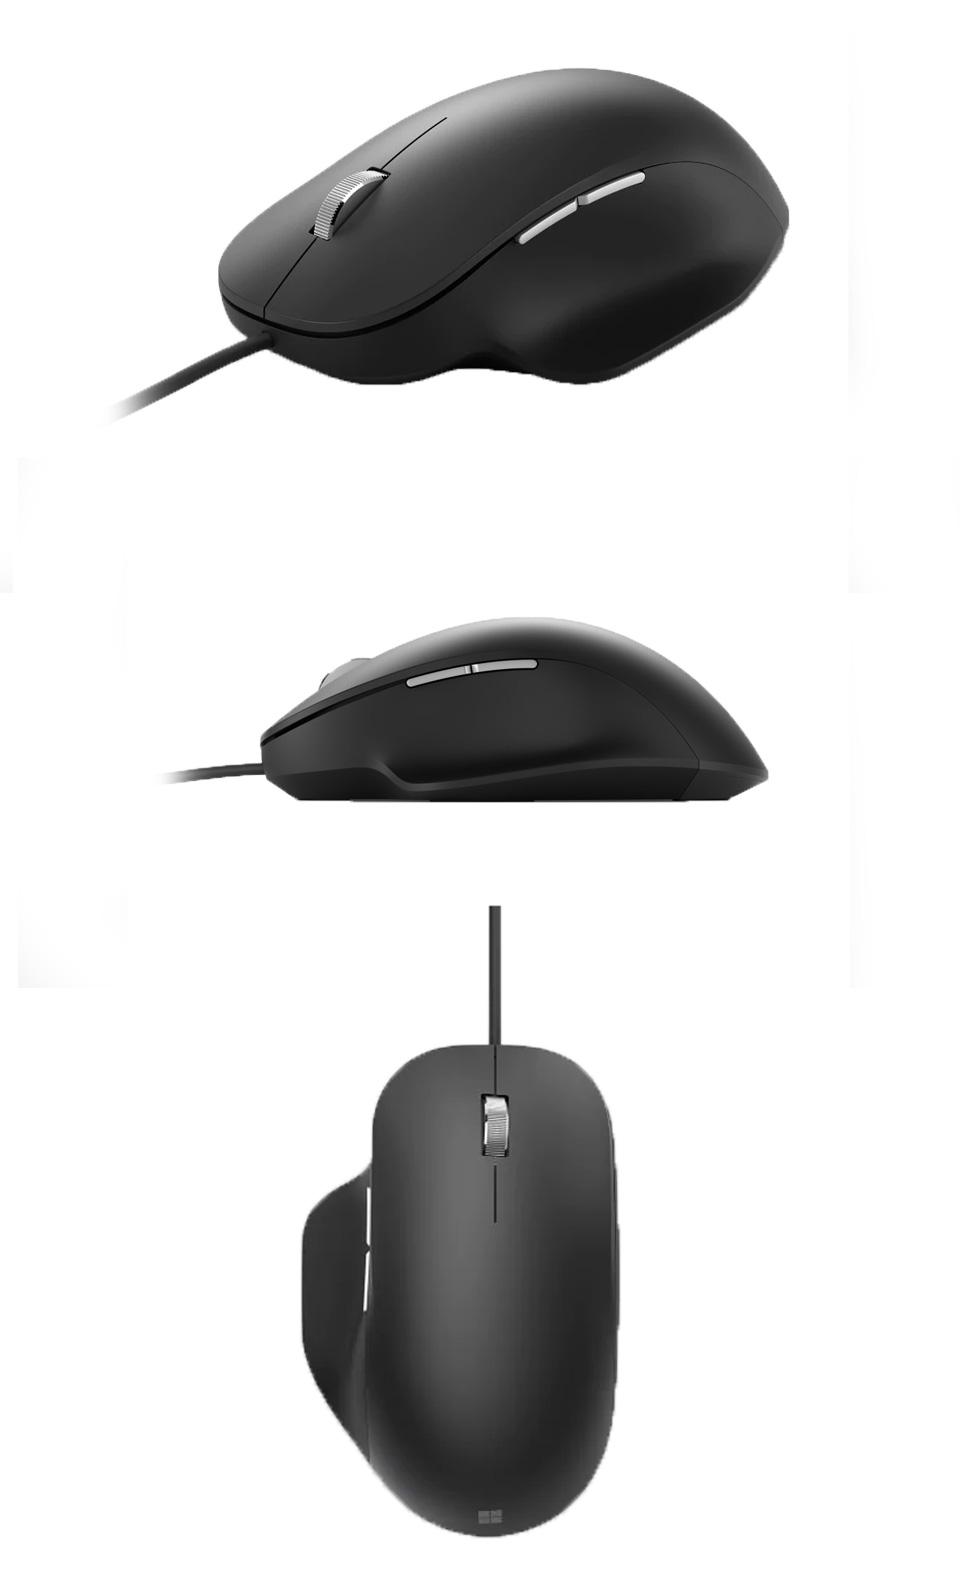 Microsoft Ergonomic USB Mouse product